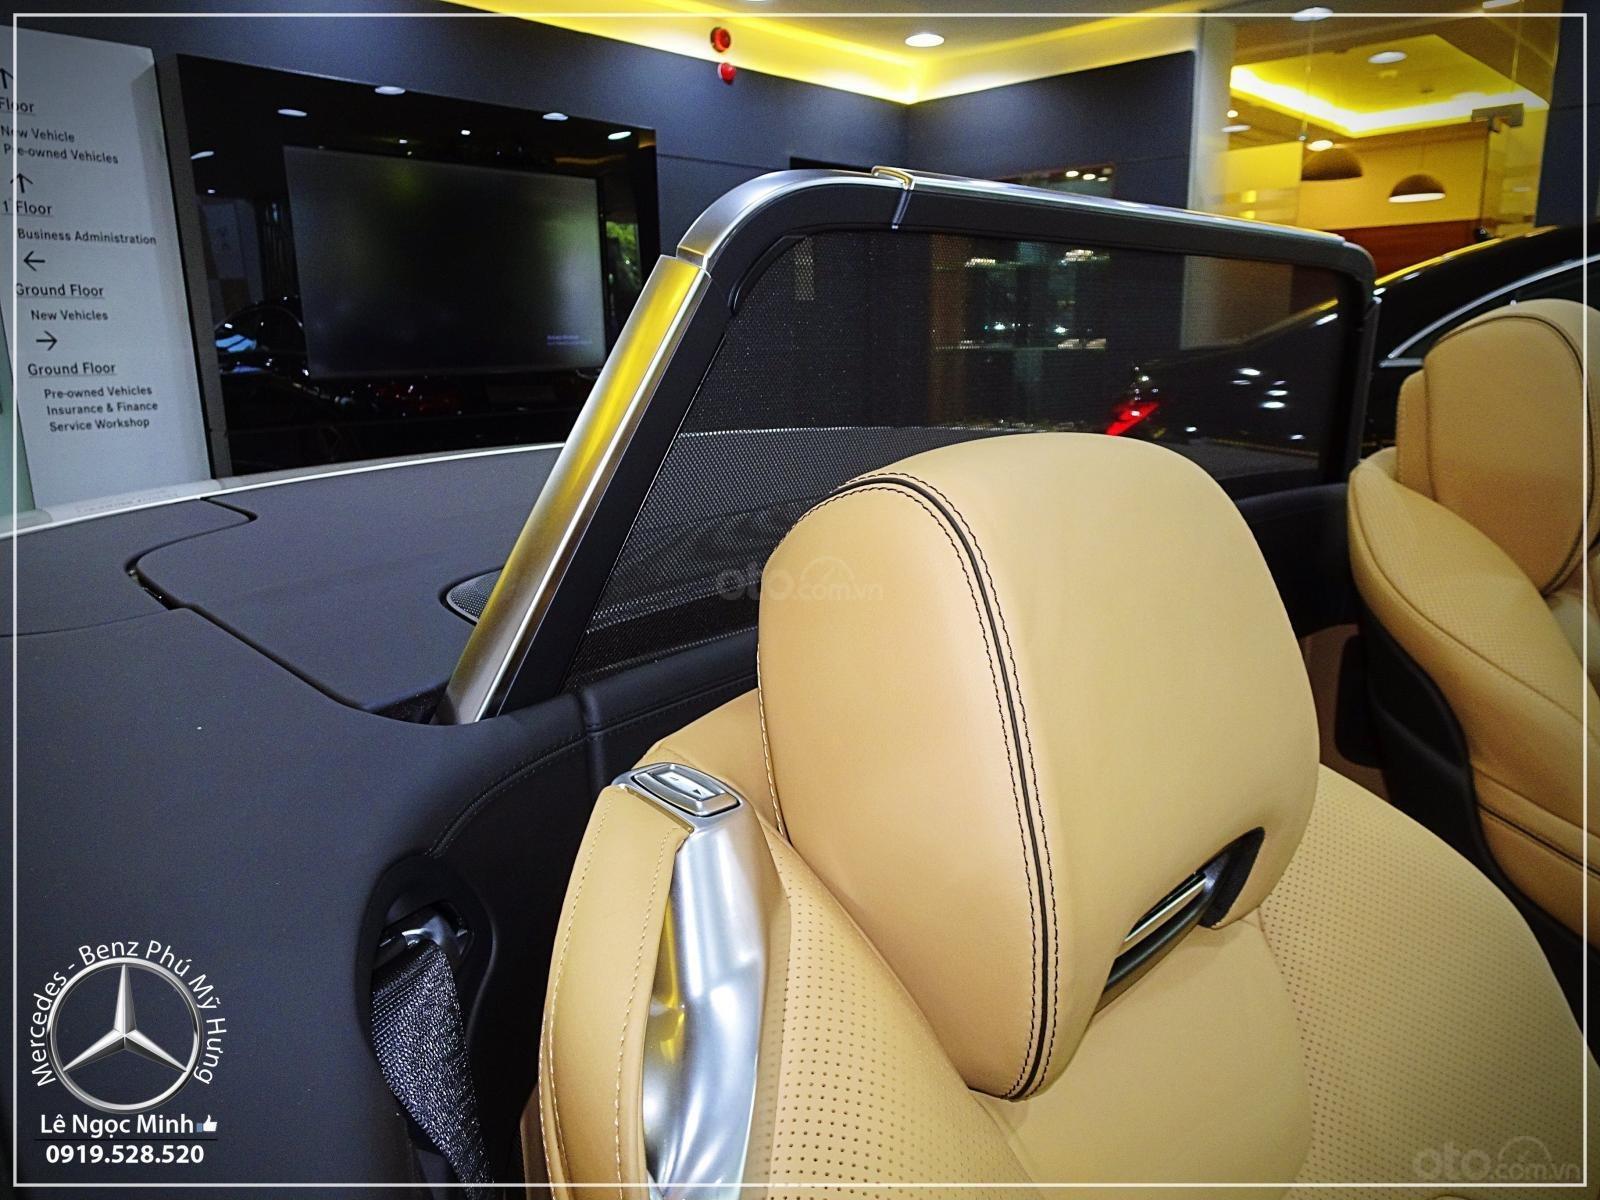 Mercedes-Benz SL 400 model 2020 - Xe thể thao mui trần 2 cửa- LH Đặt xe: 0919 528 520 - hỗ trợ Bank 80% (23)